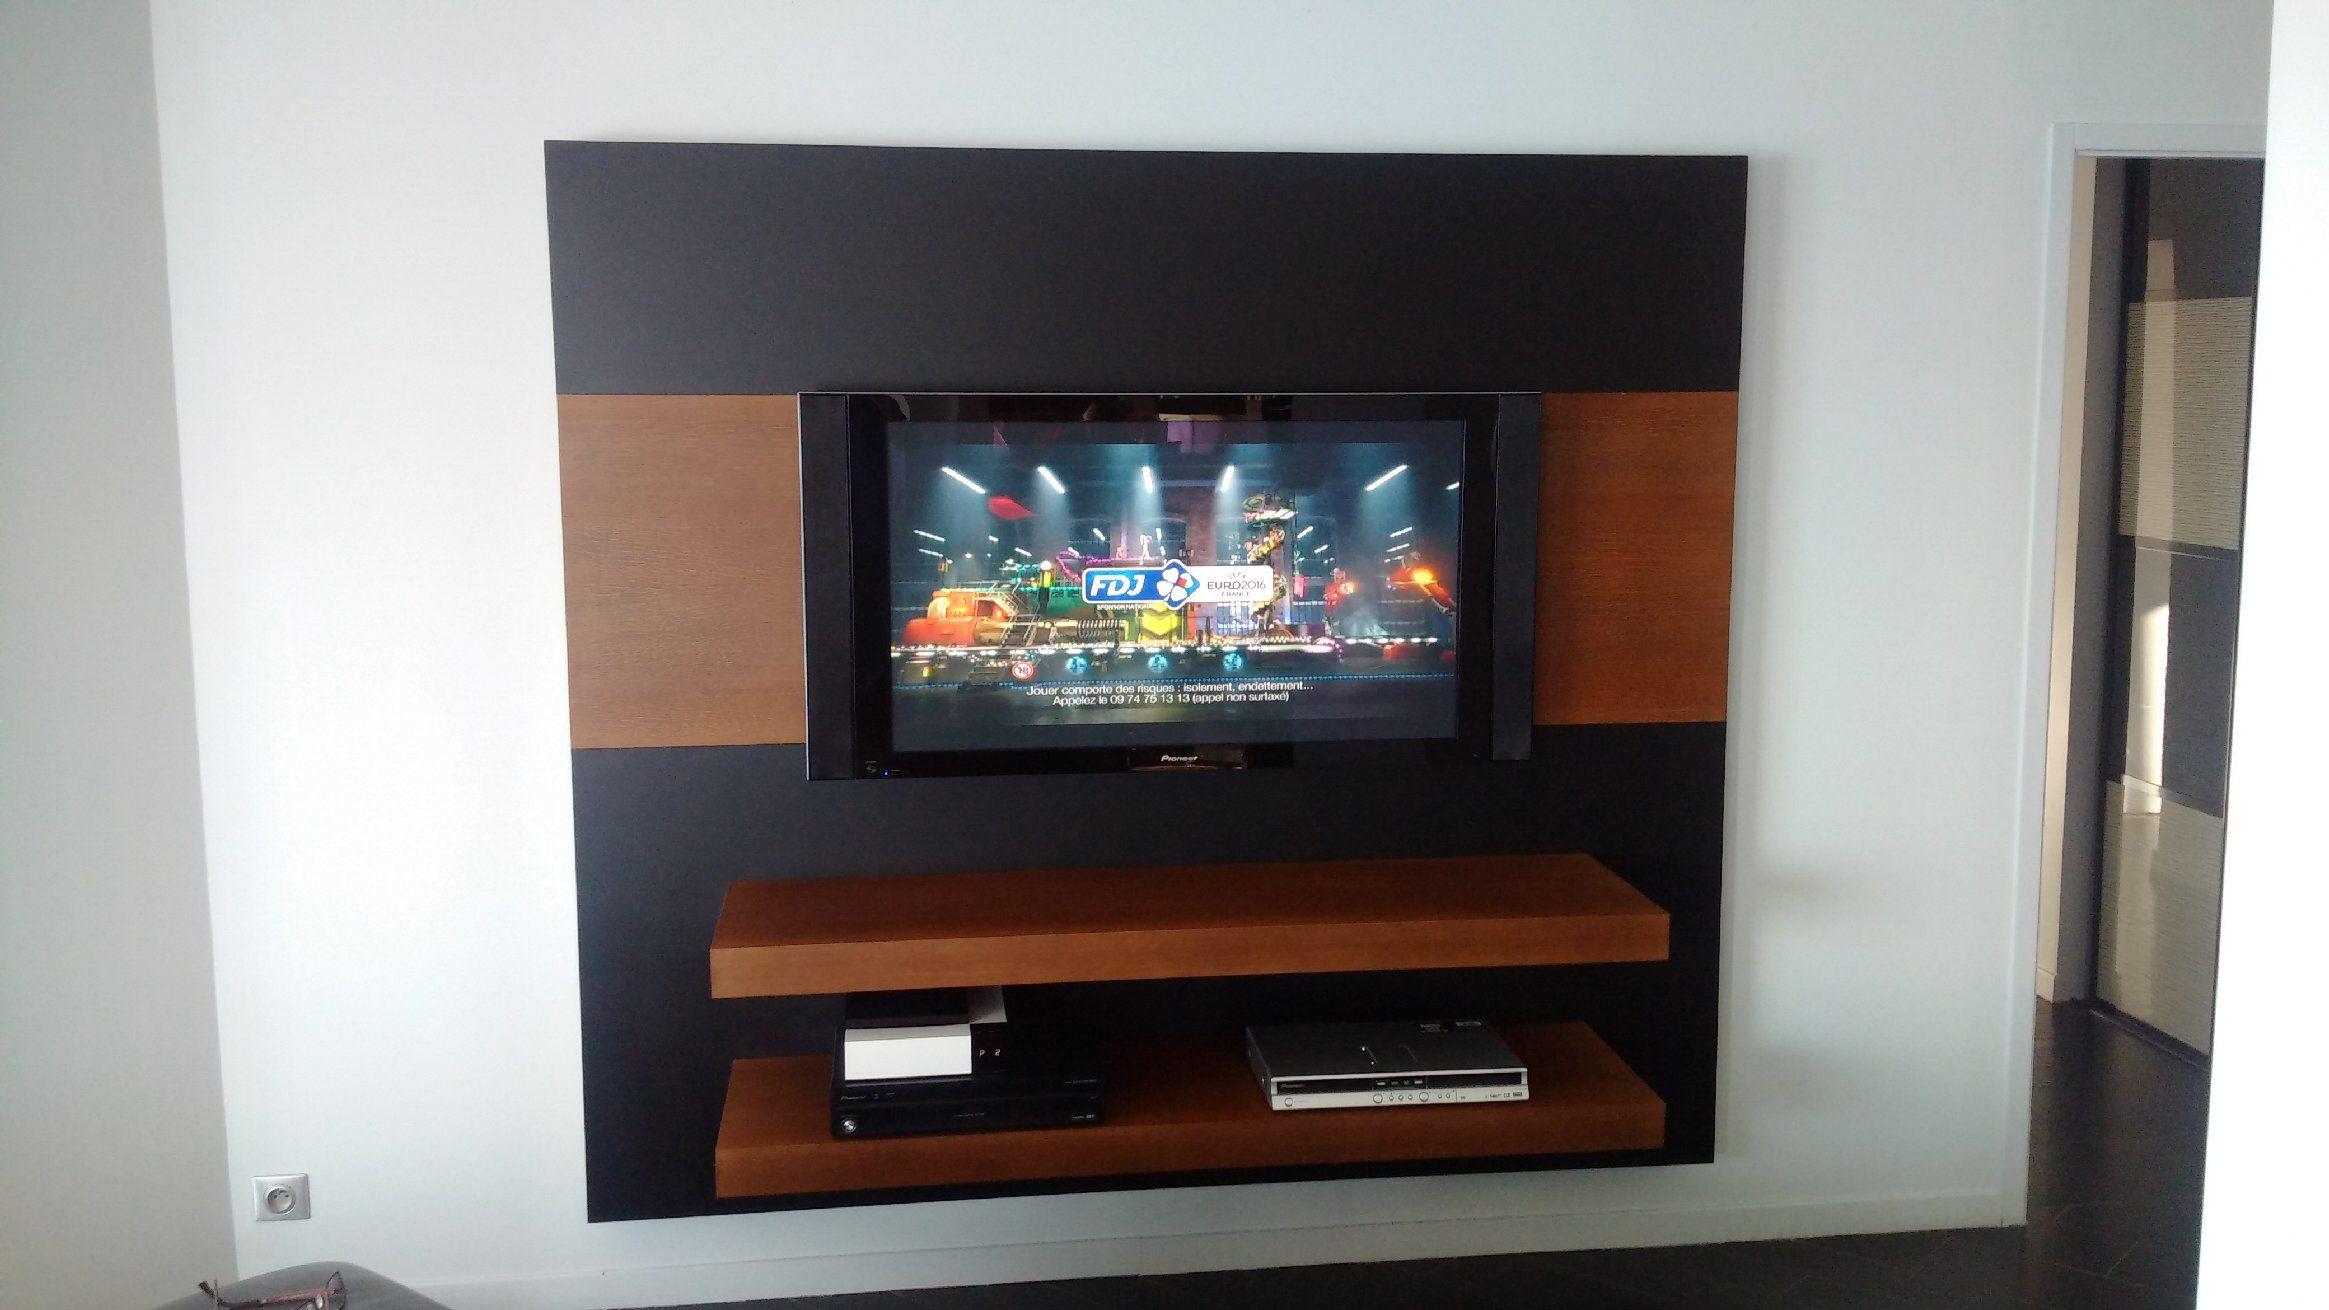 Meuble Tv Suspendu Laqu Noir Mat Et Ch Ne Teint Vernis Brun  # Meuble Tv Suspendu Plan Chene